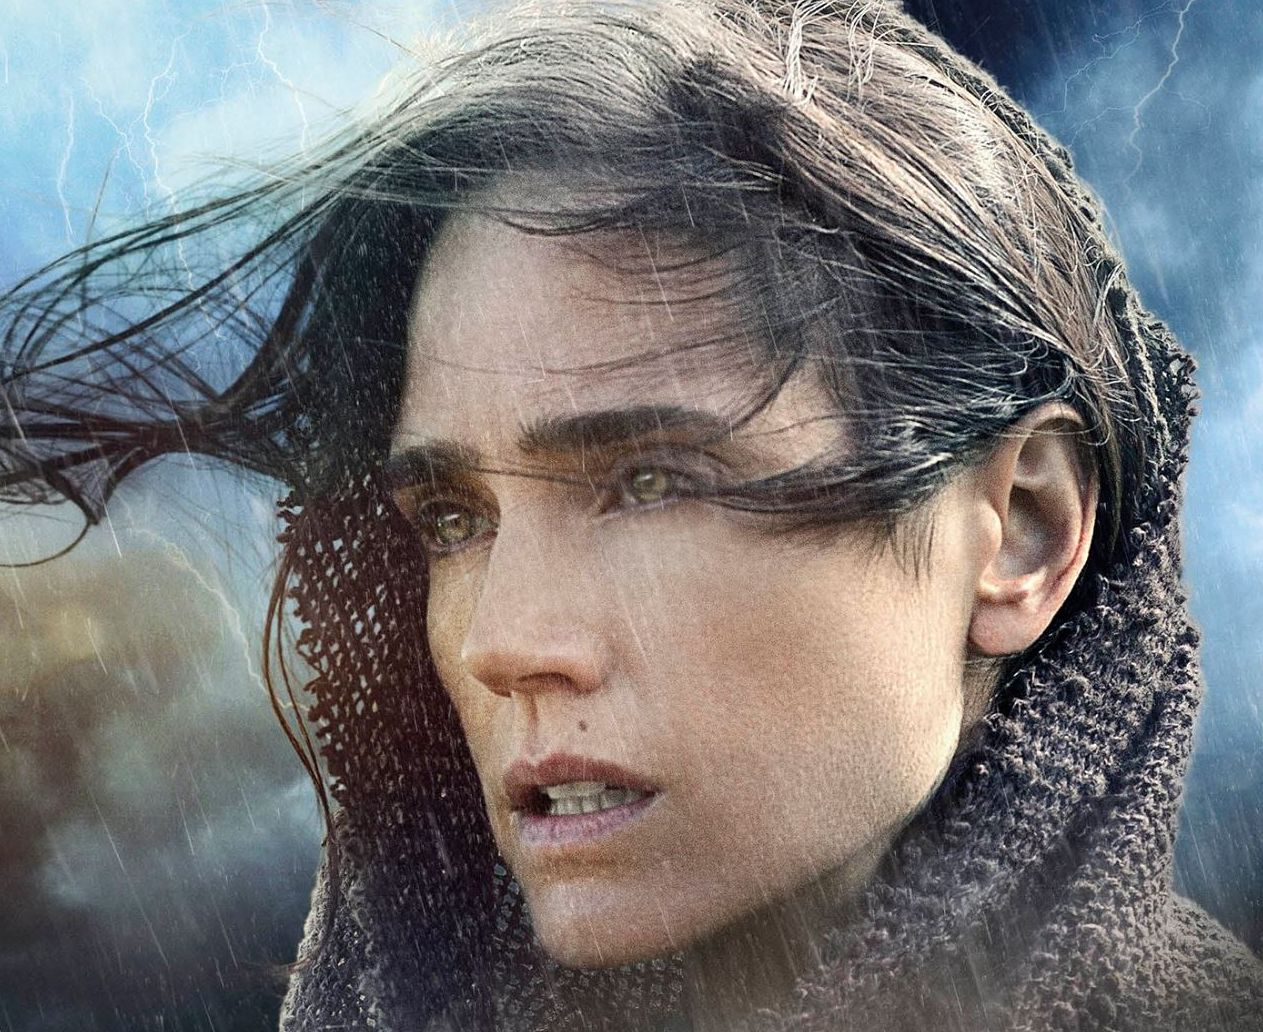 Jennifer Connely in the rain as well, Noah